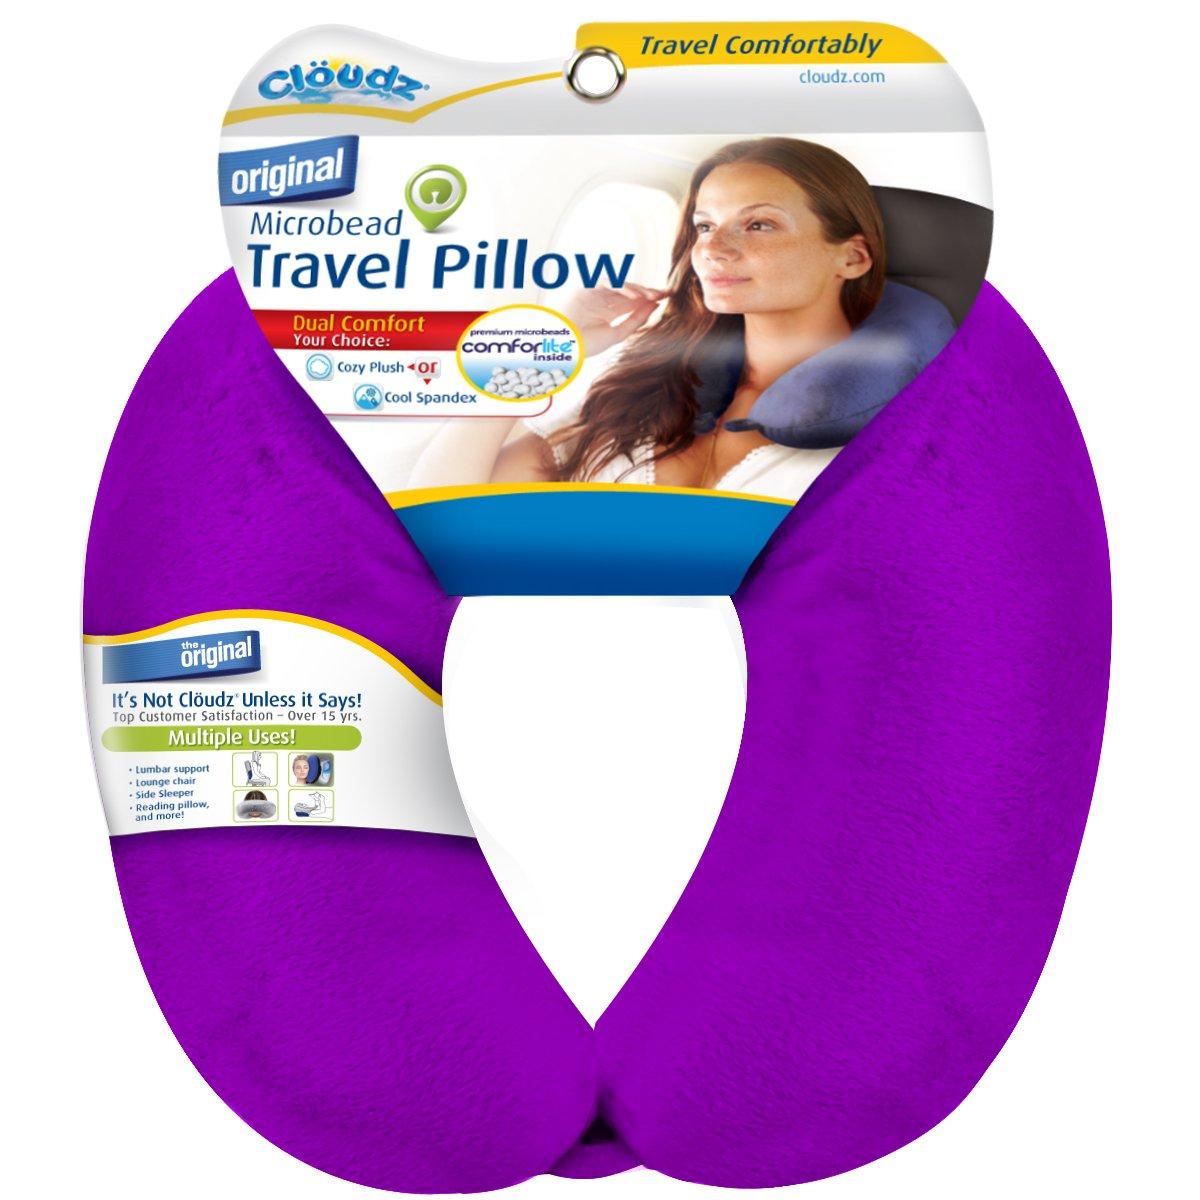 Cloudz Microbead Travel Neck Pillow - Black PIL-034019